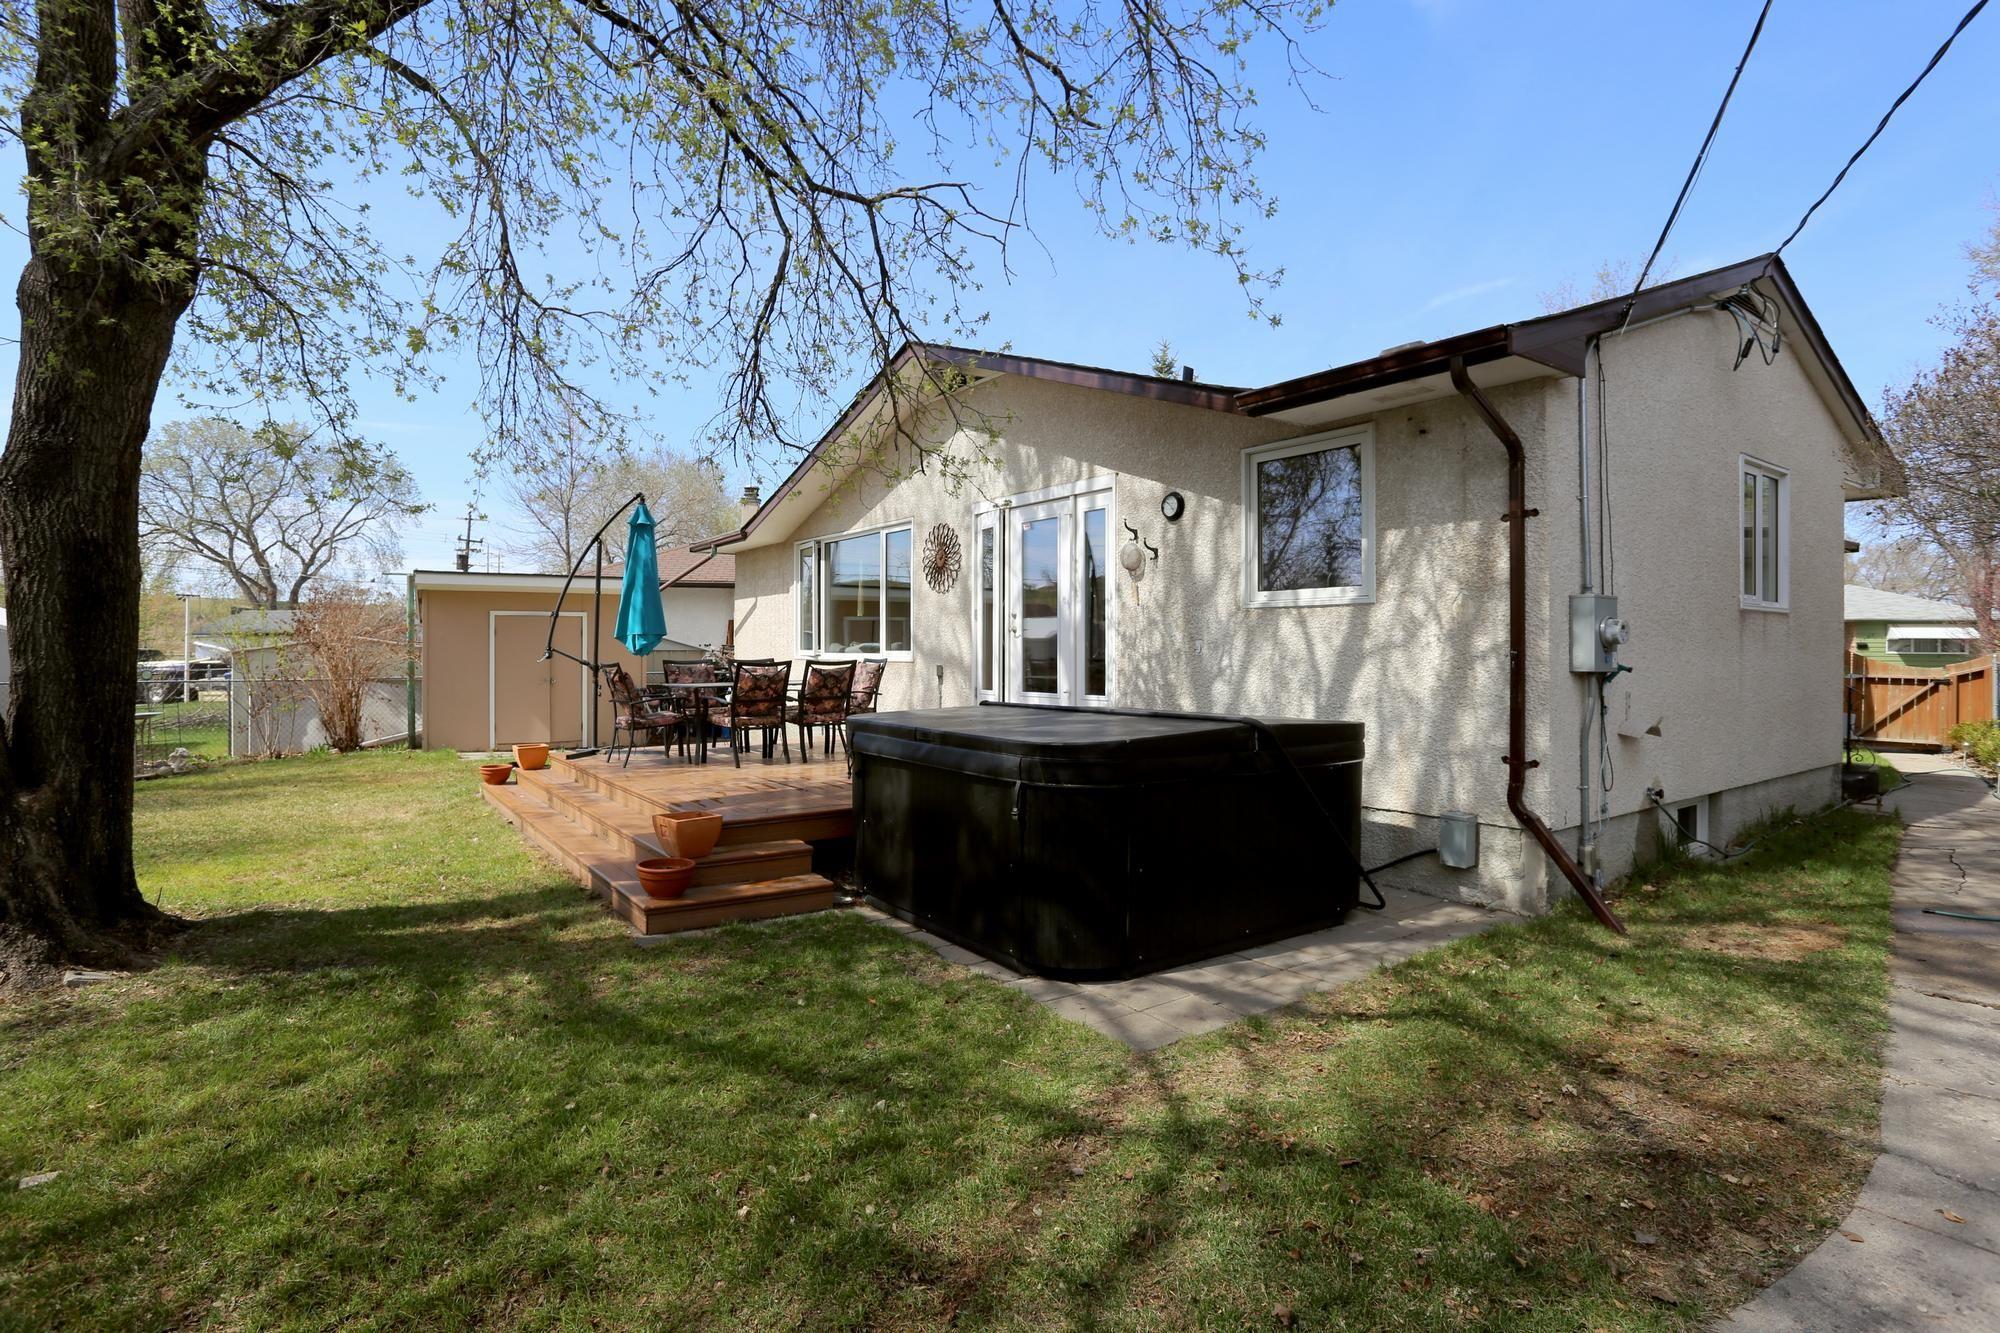 Photo 7: Photos: 1322 Valour Road in Winnipeg: Sargent Park Single Family Detached for sale (5C)  : MLS®# 1811835